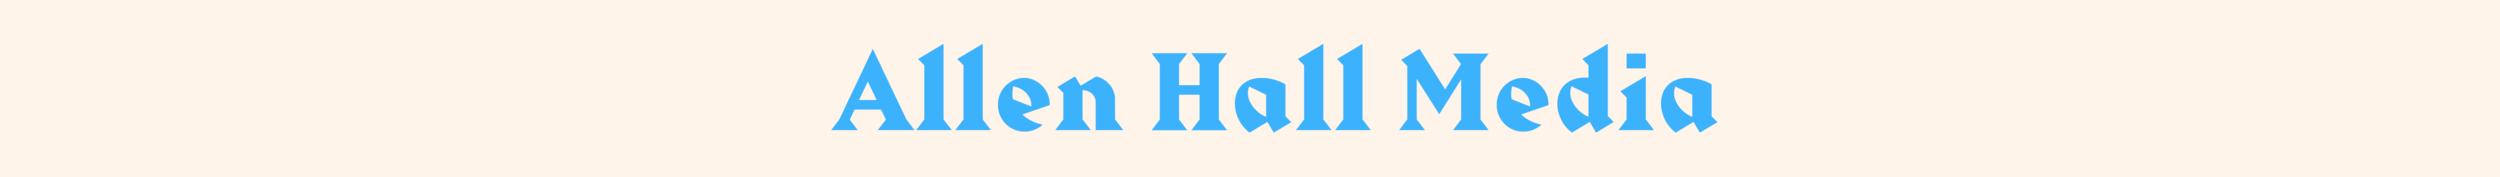 AllenHallMedia_PageHeader.png